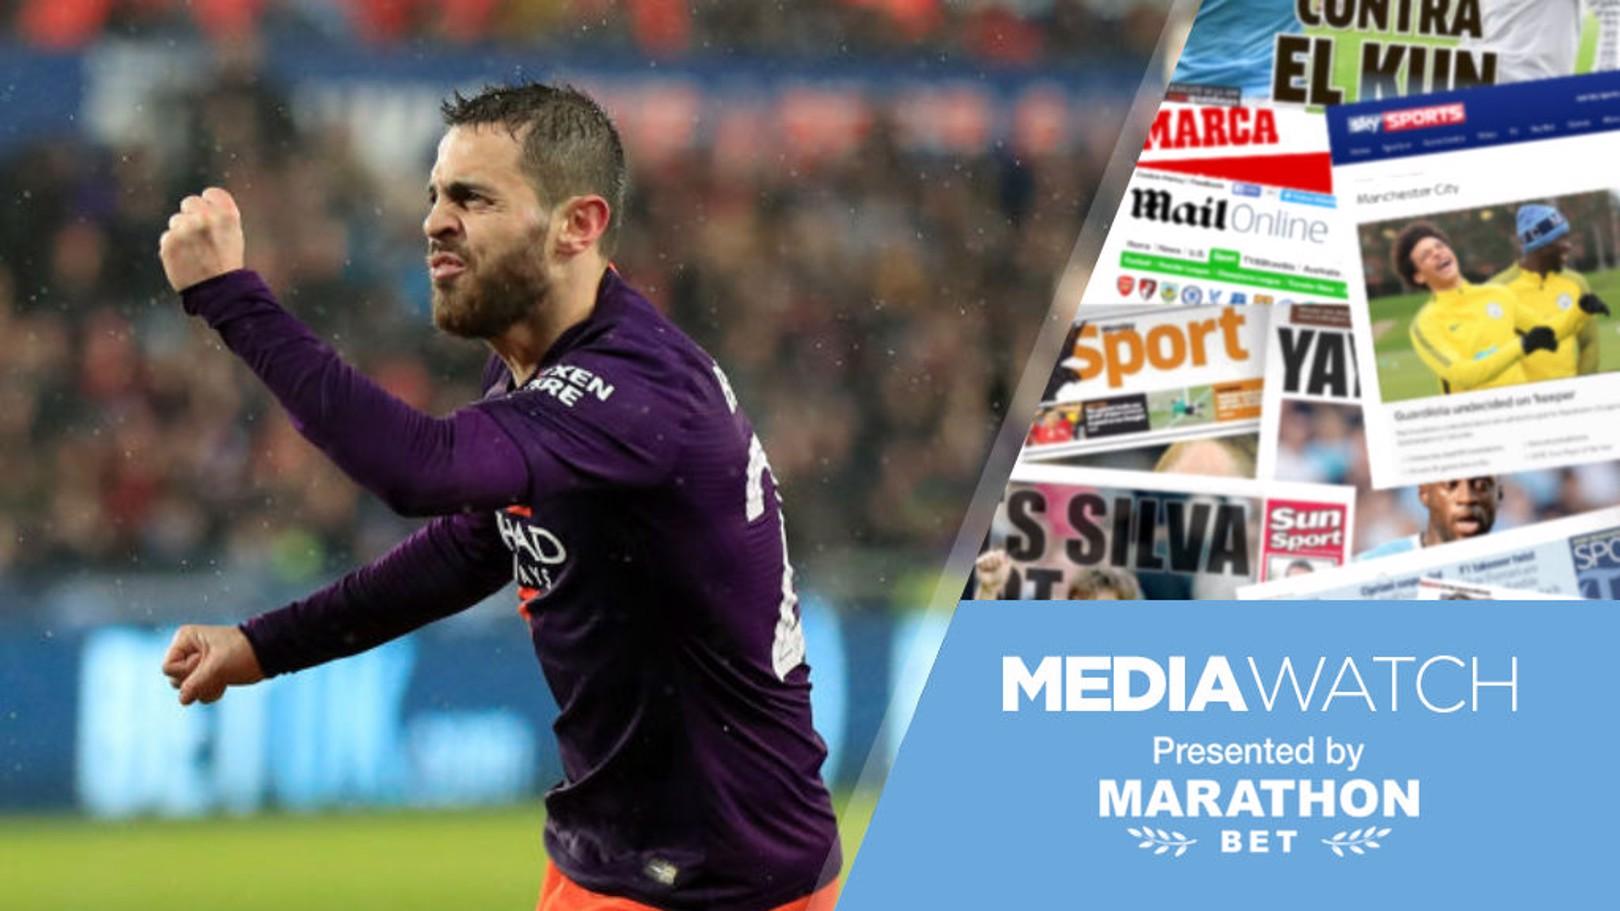 Media Watch: Bernardo - This season can be special